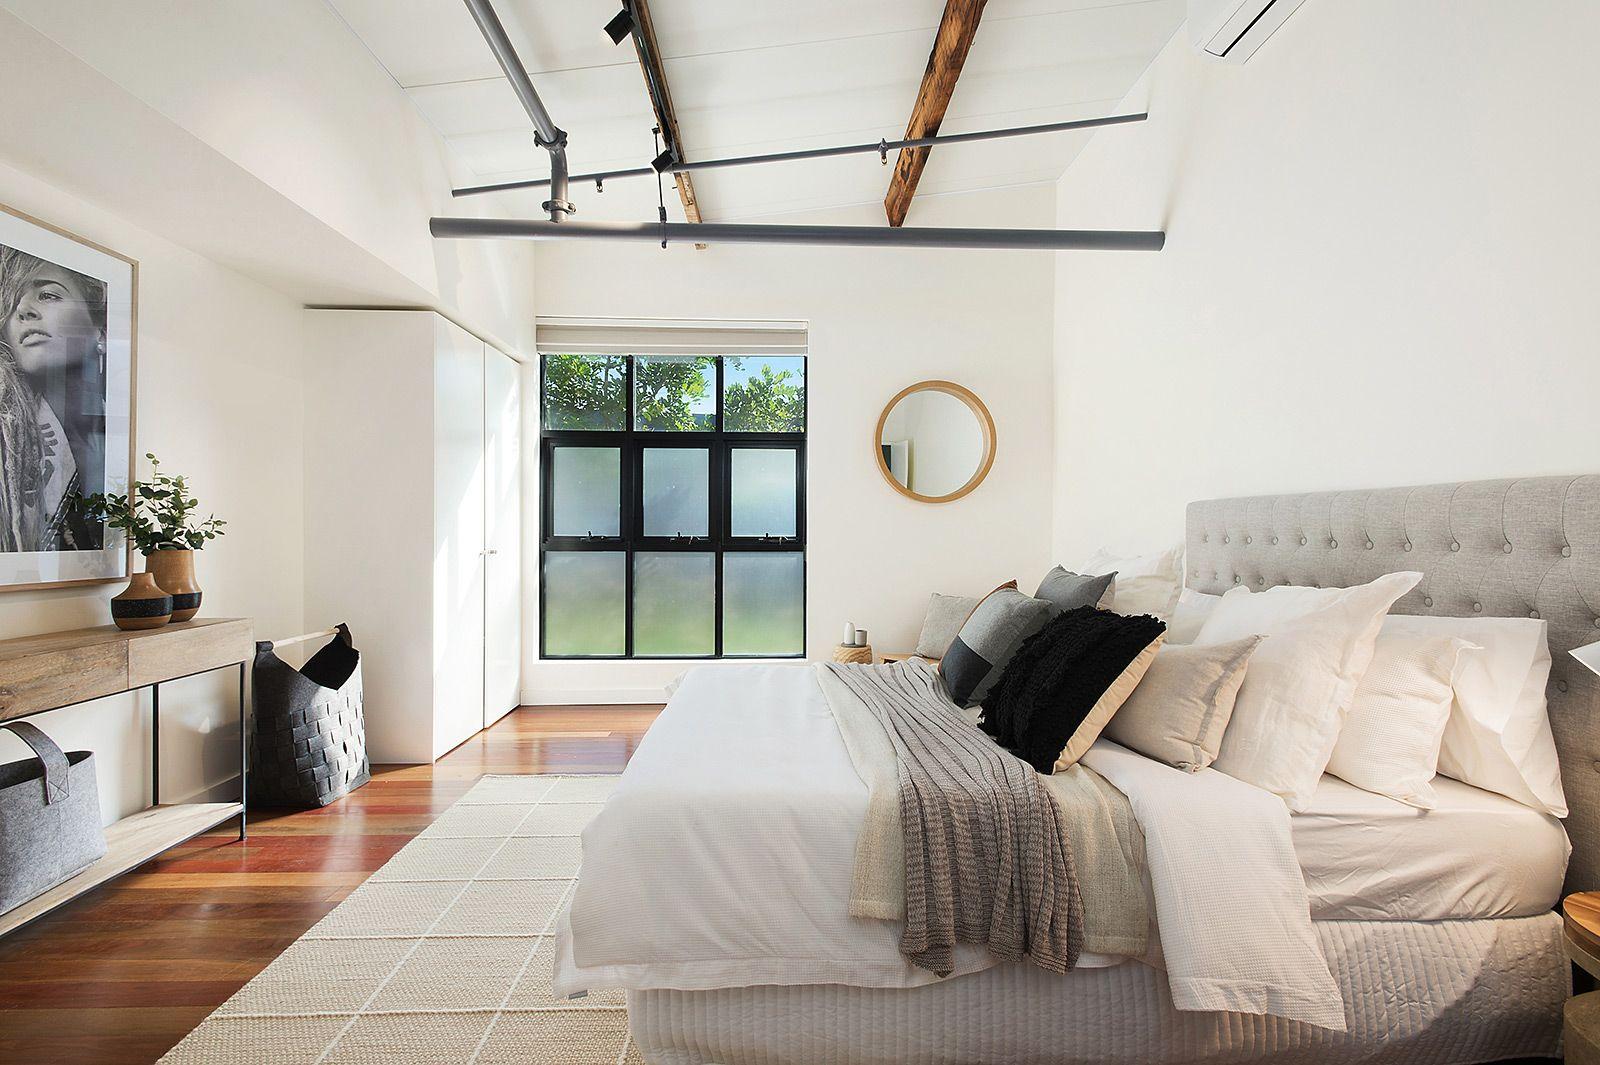 Bowerbird interiors bedroom pillow cushion grey linen print design